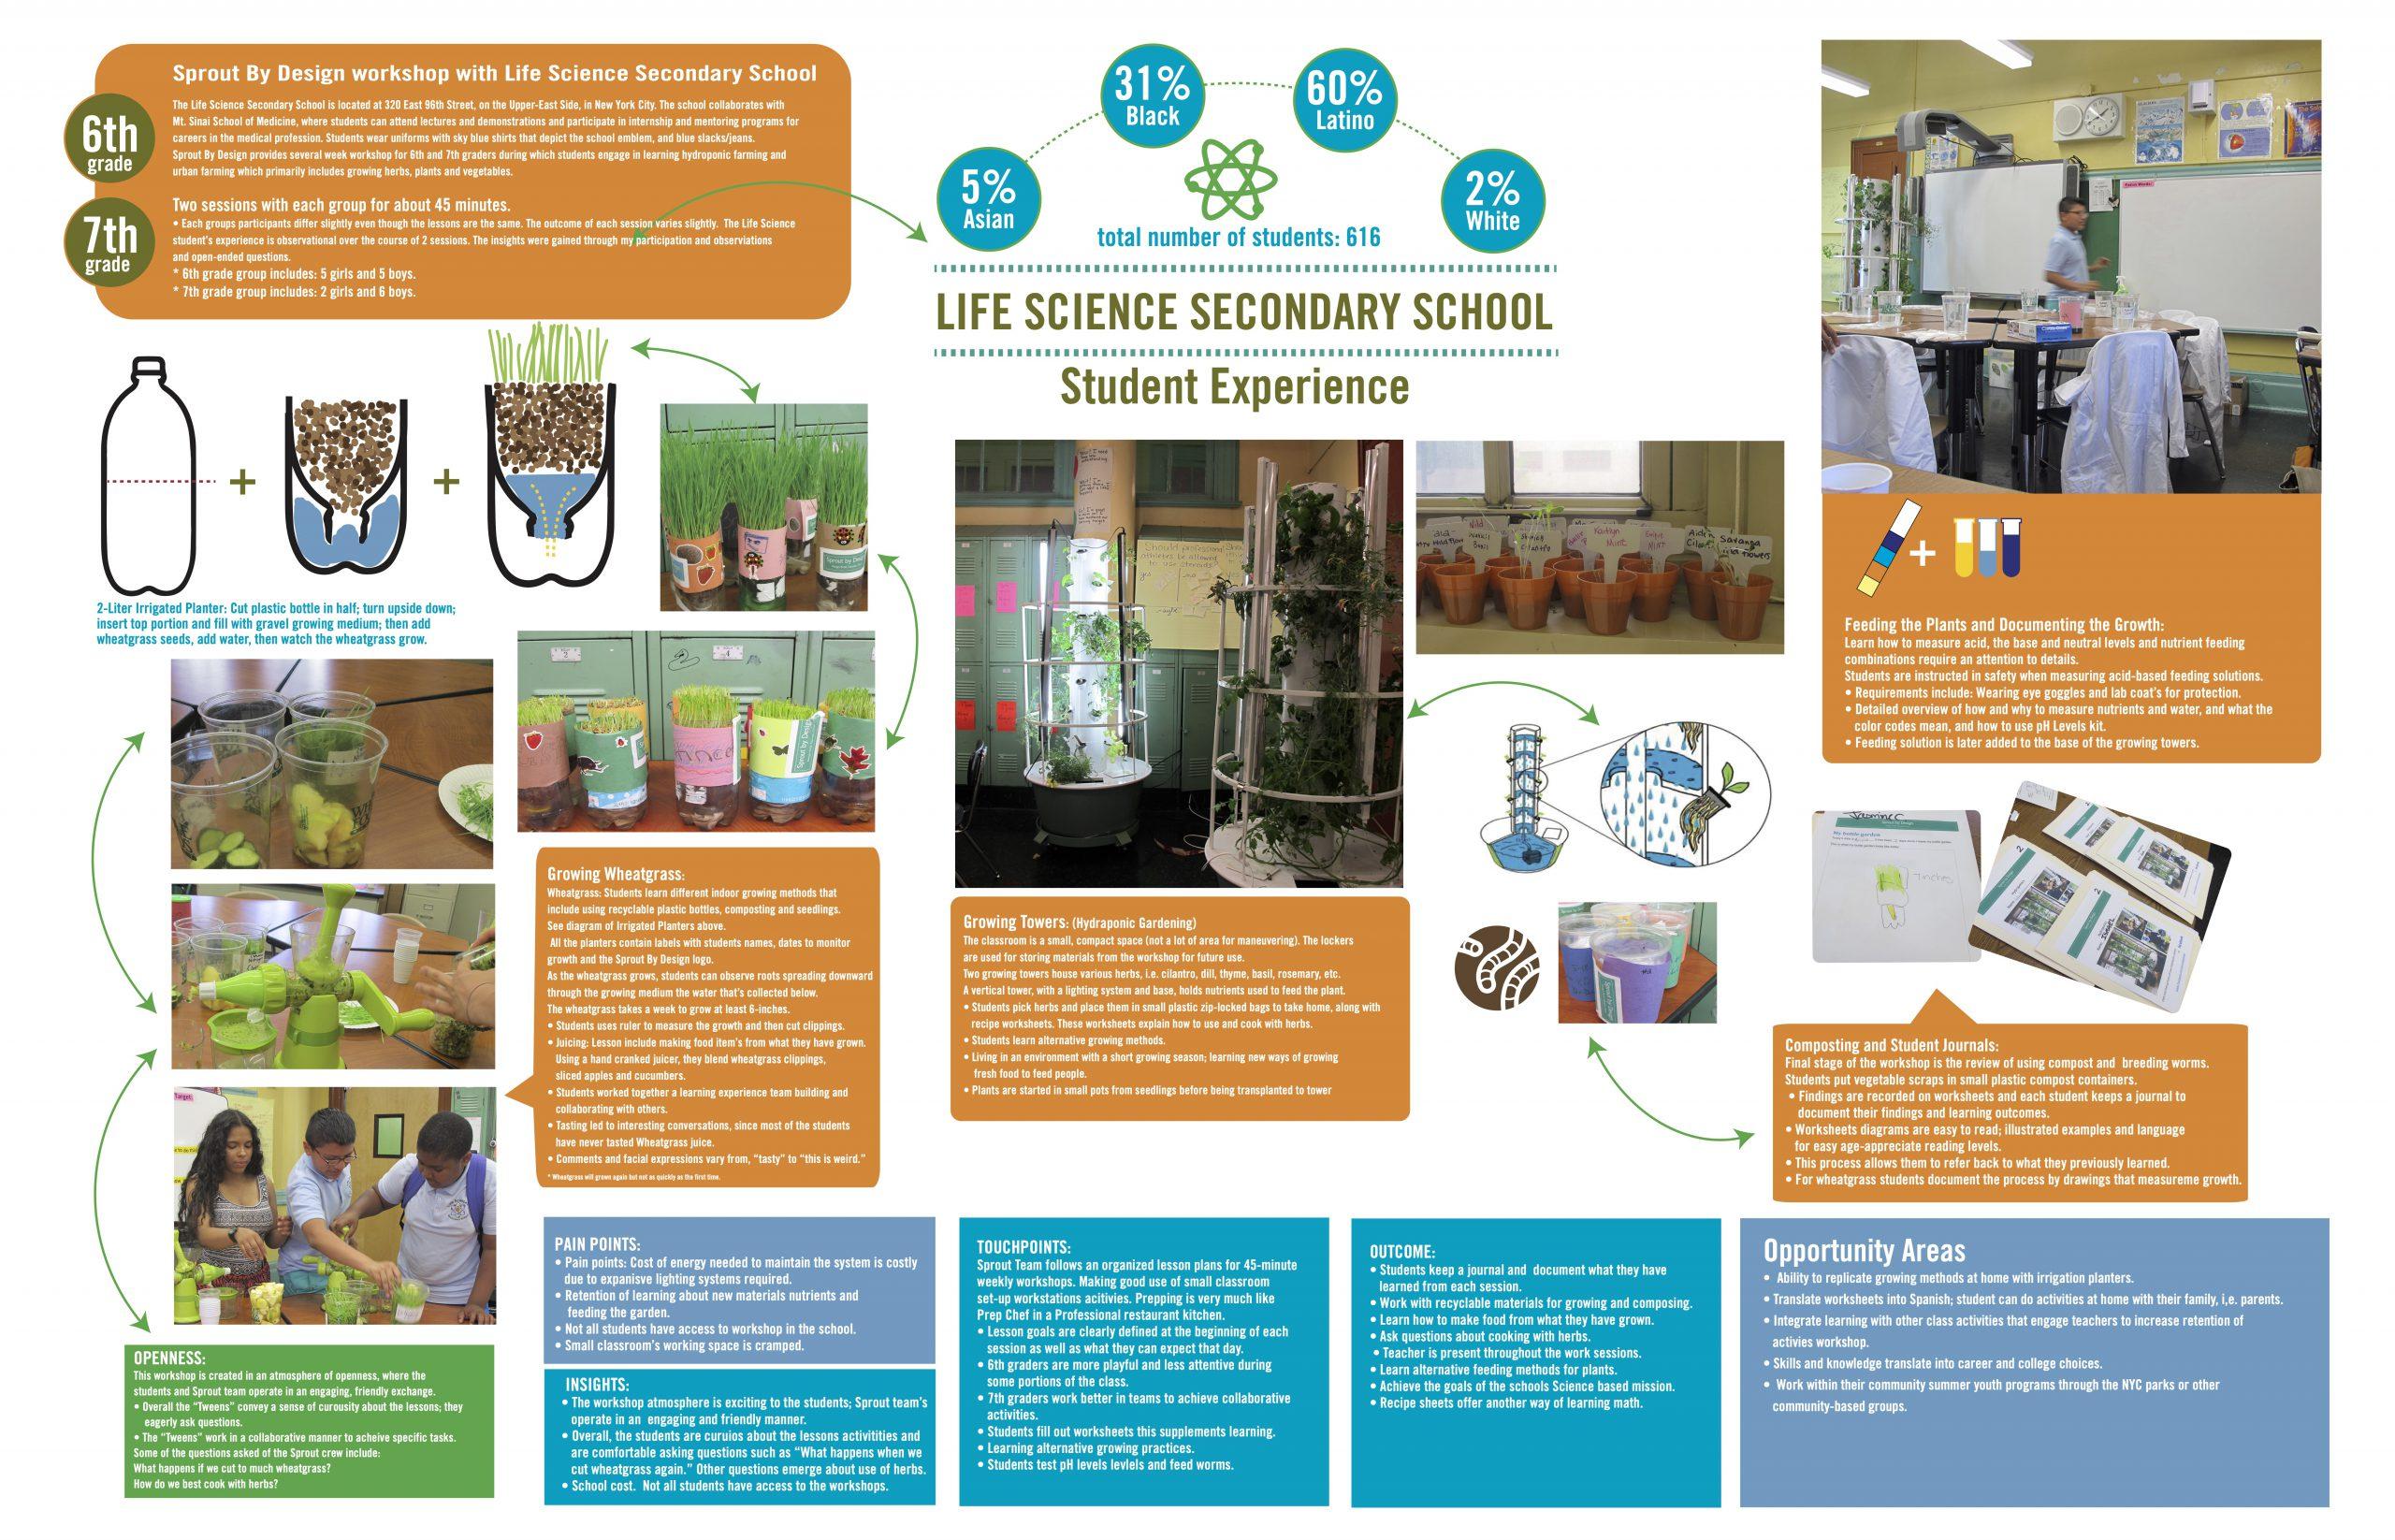 002_lo-res-FInal Life Science.04.13